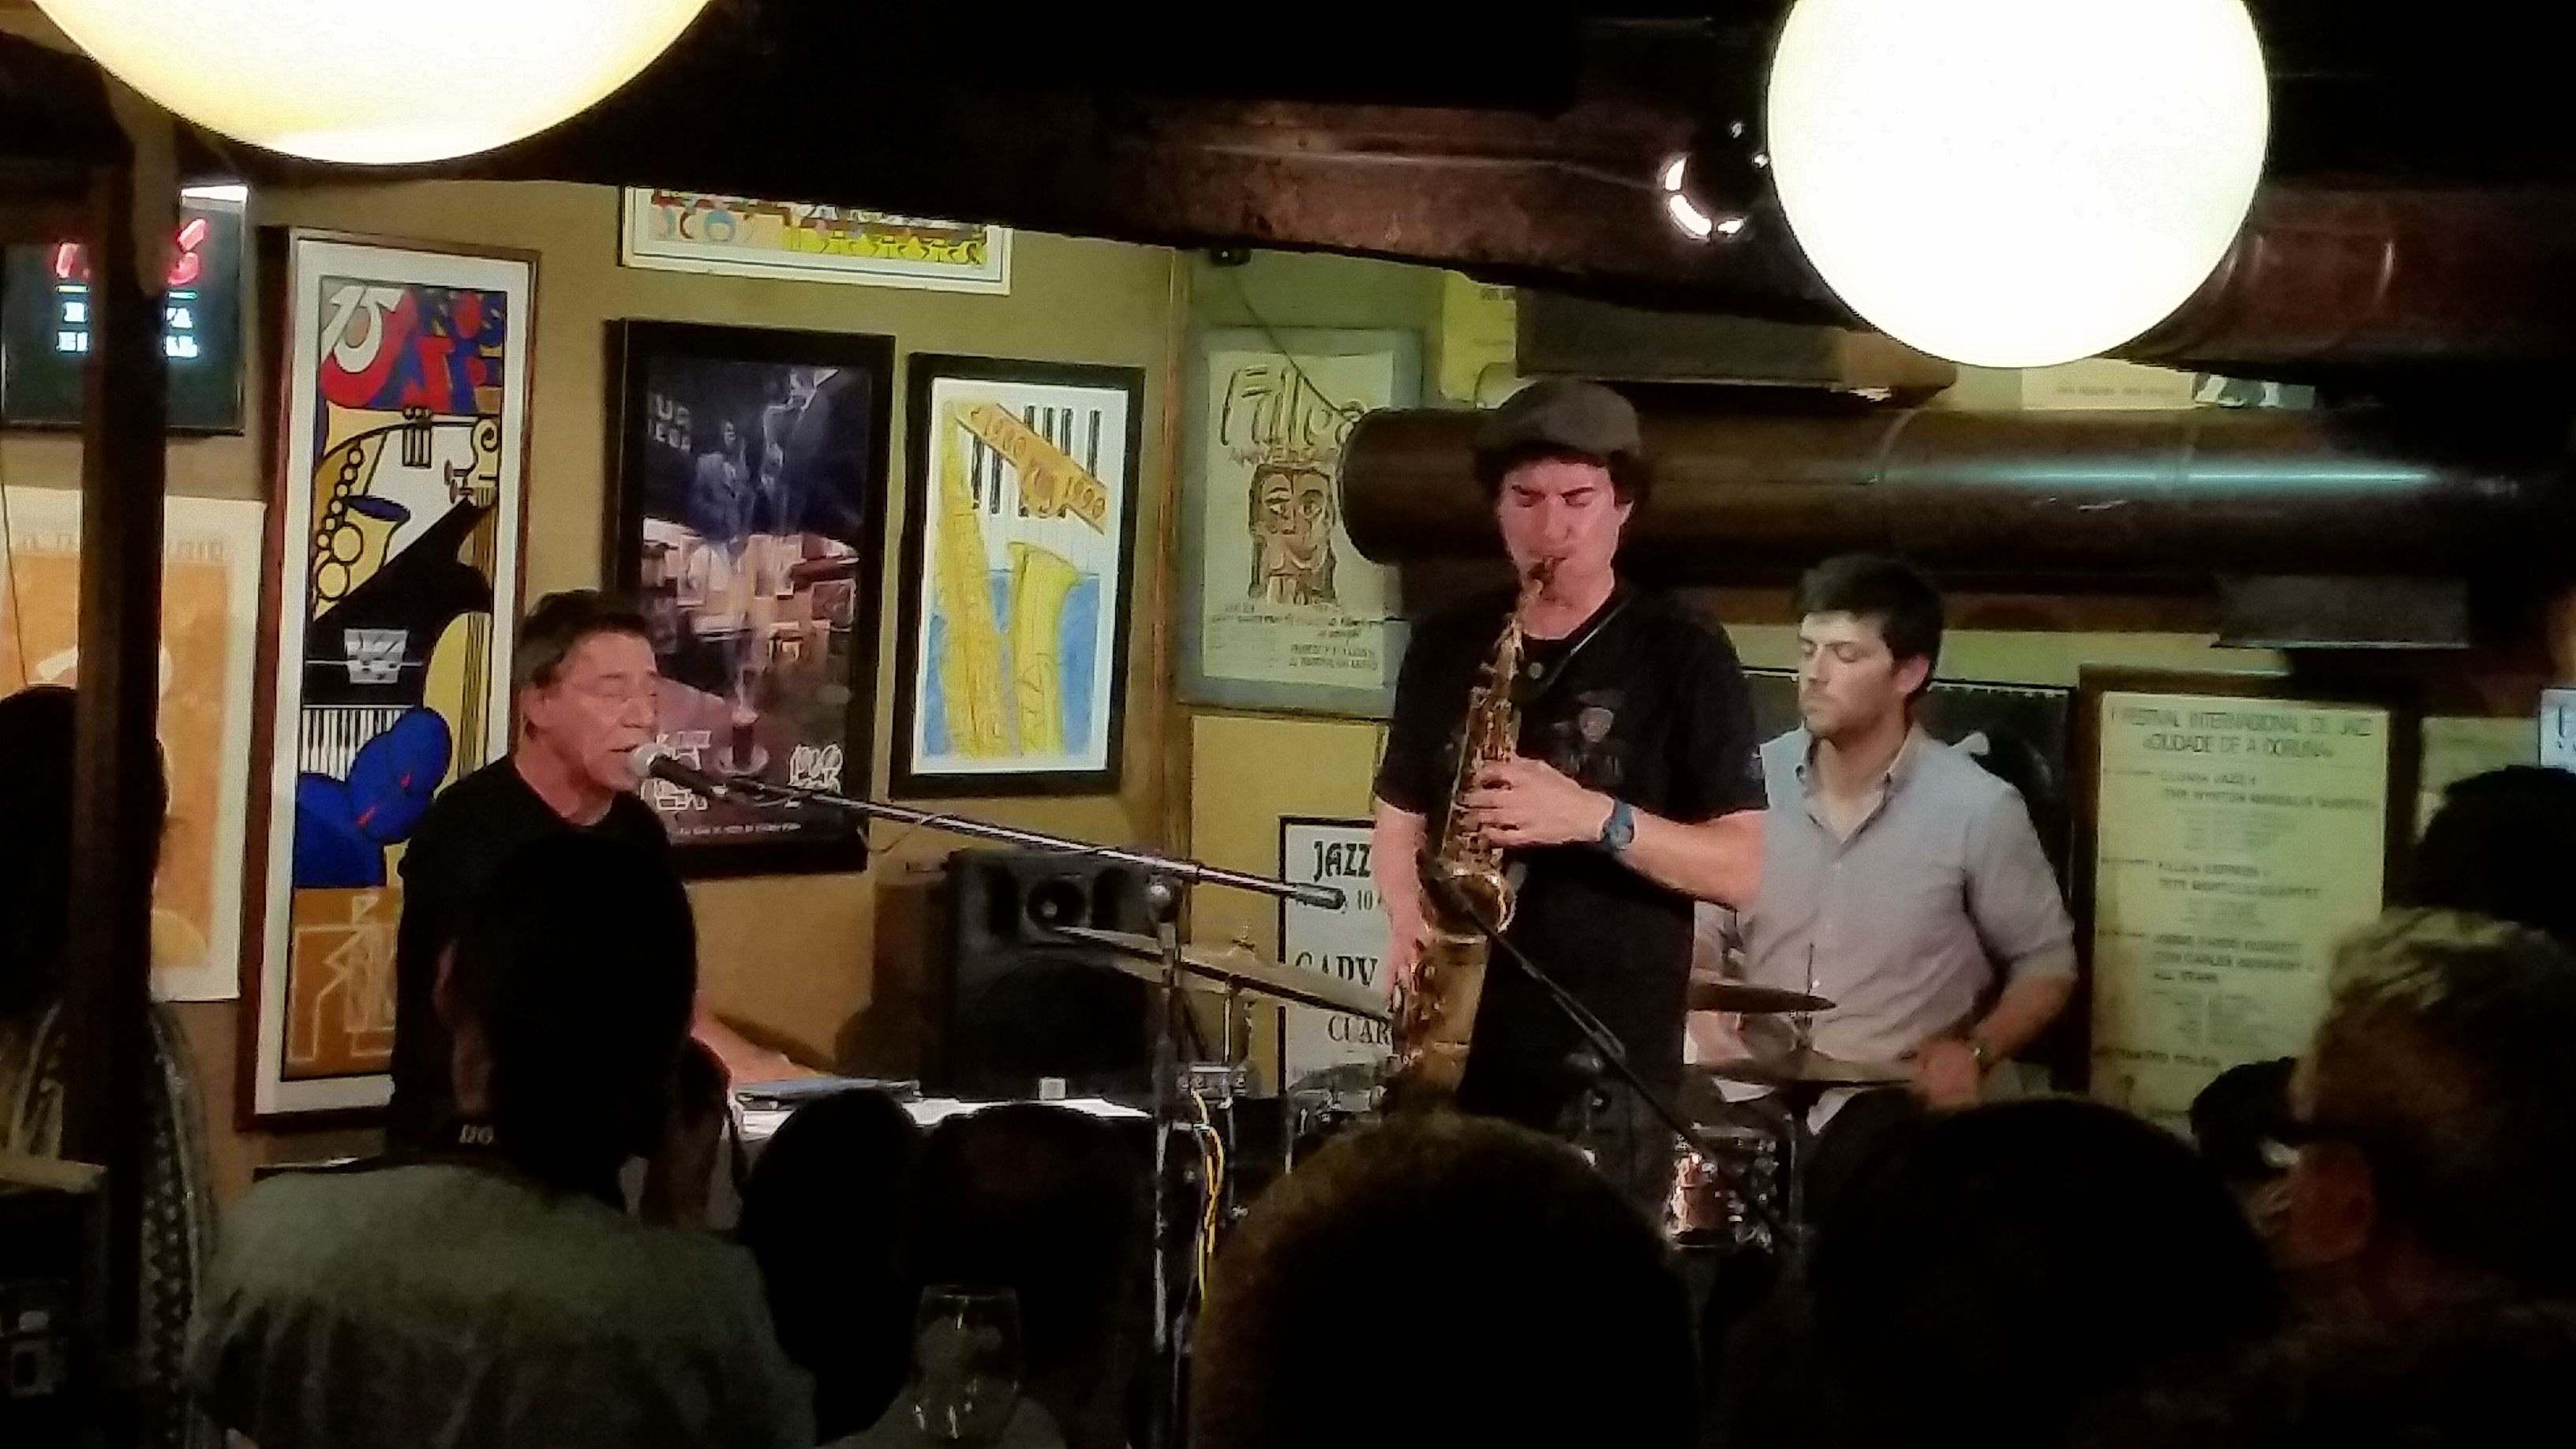 Crónica de André Sarbib Dúo. Jazz Filloa, A Coruña. 24 de julio de 2015. II Festival + Que Jazz